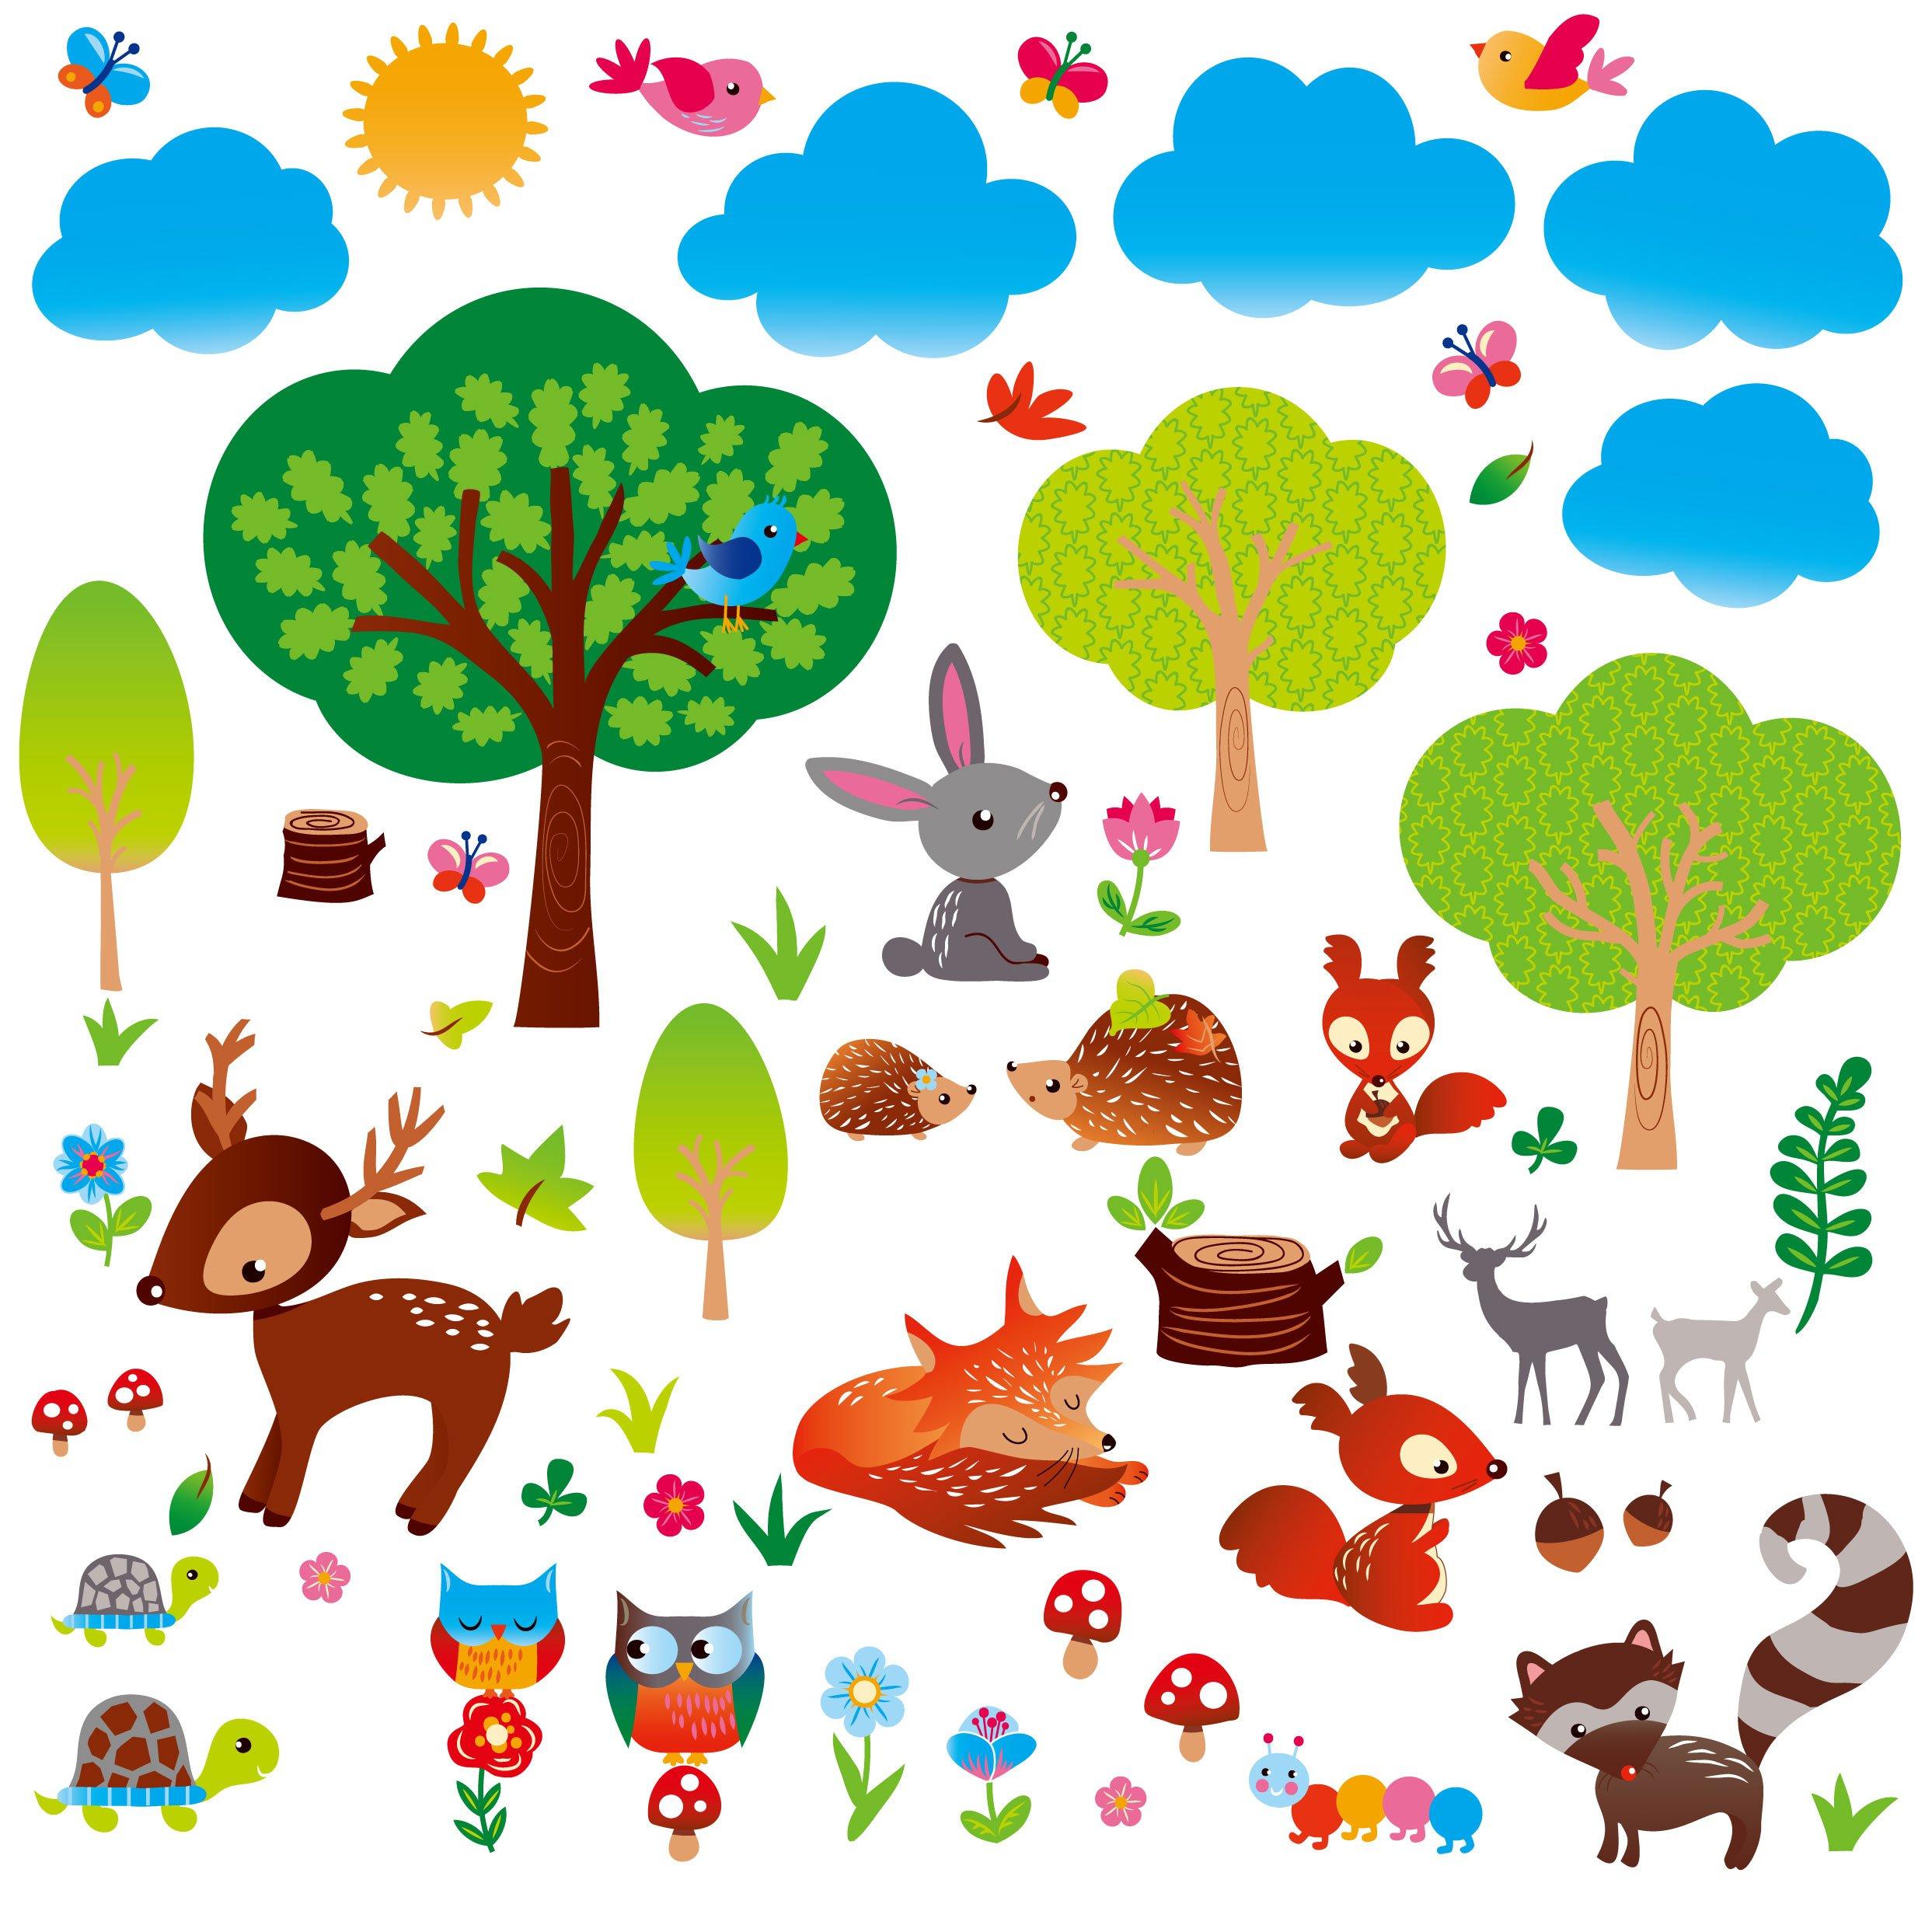 Woodland Friends Nursery/Boys Room Decorative Peel & Stick Wall Art Sticker Decals